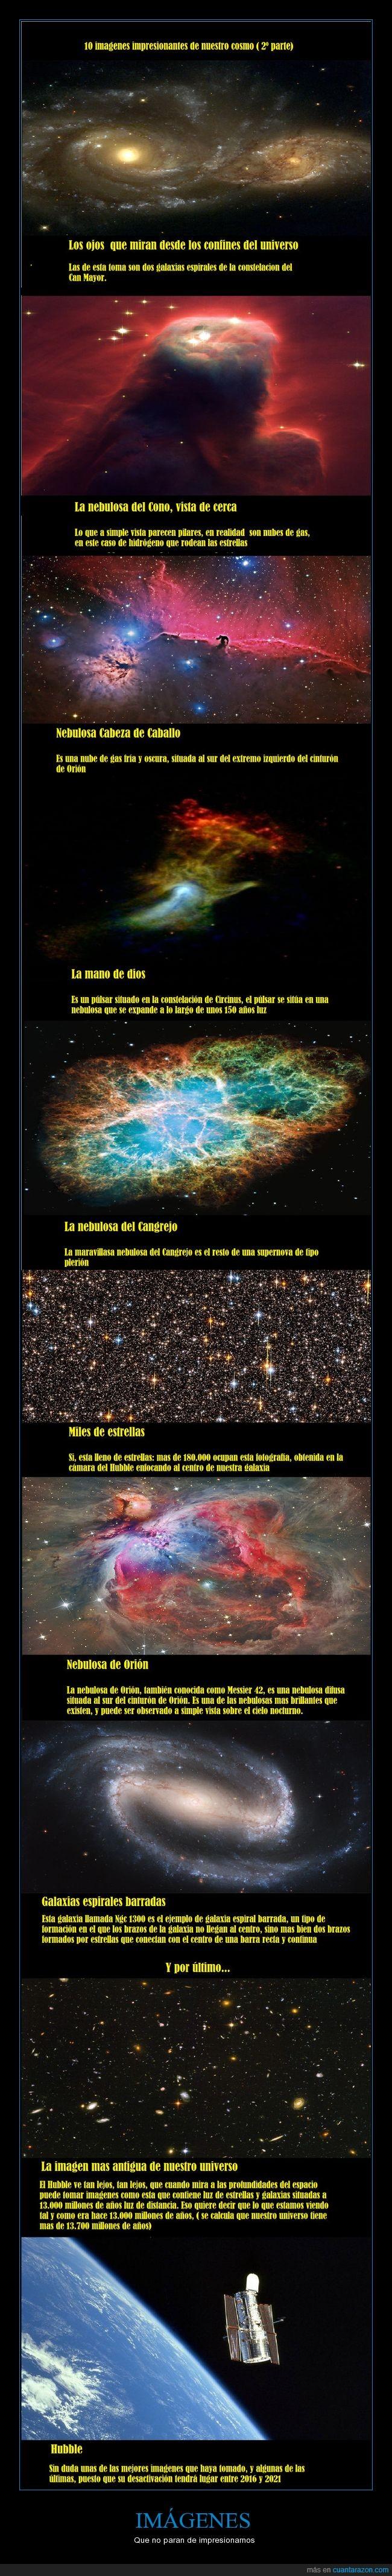 cosmos,galaxias,hubble,imagenés,nebulosas